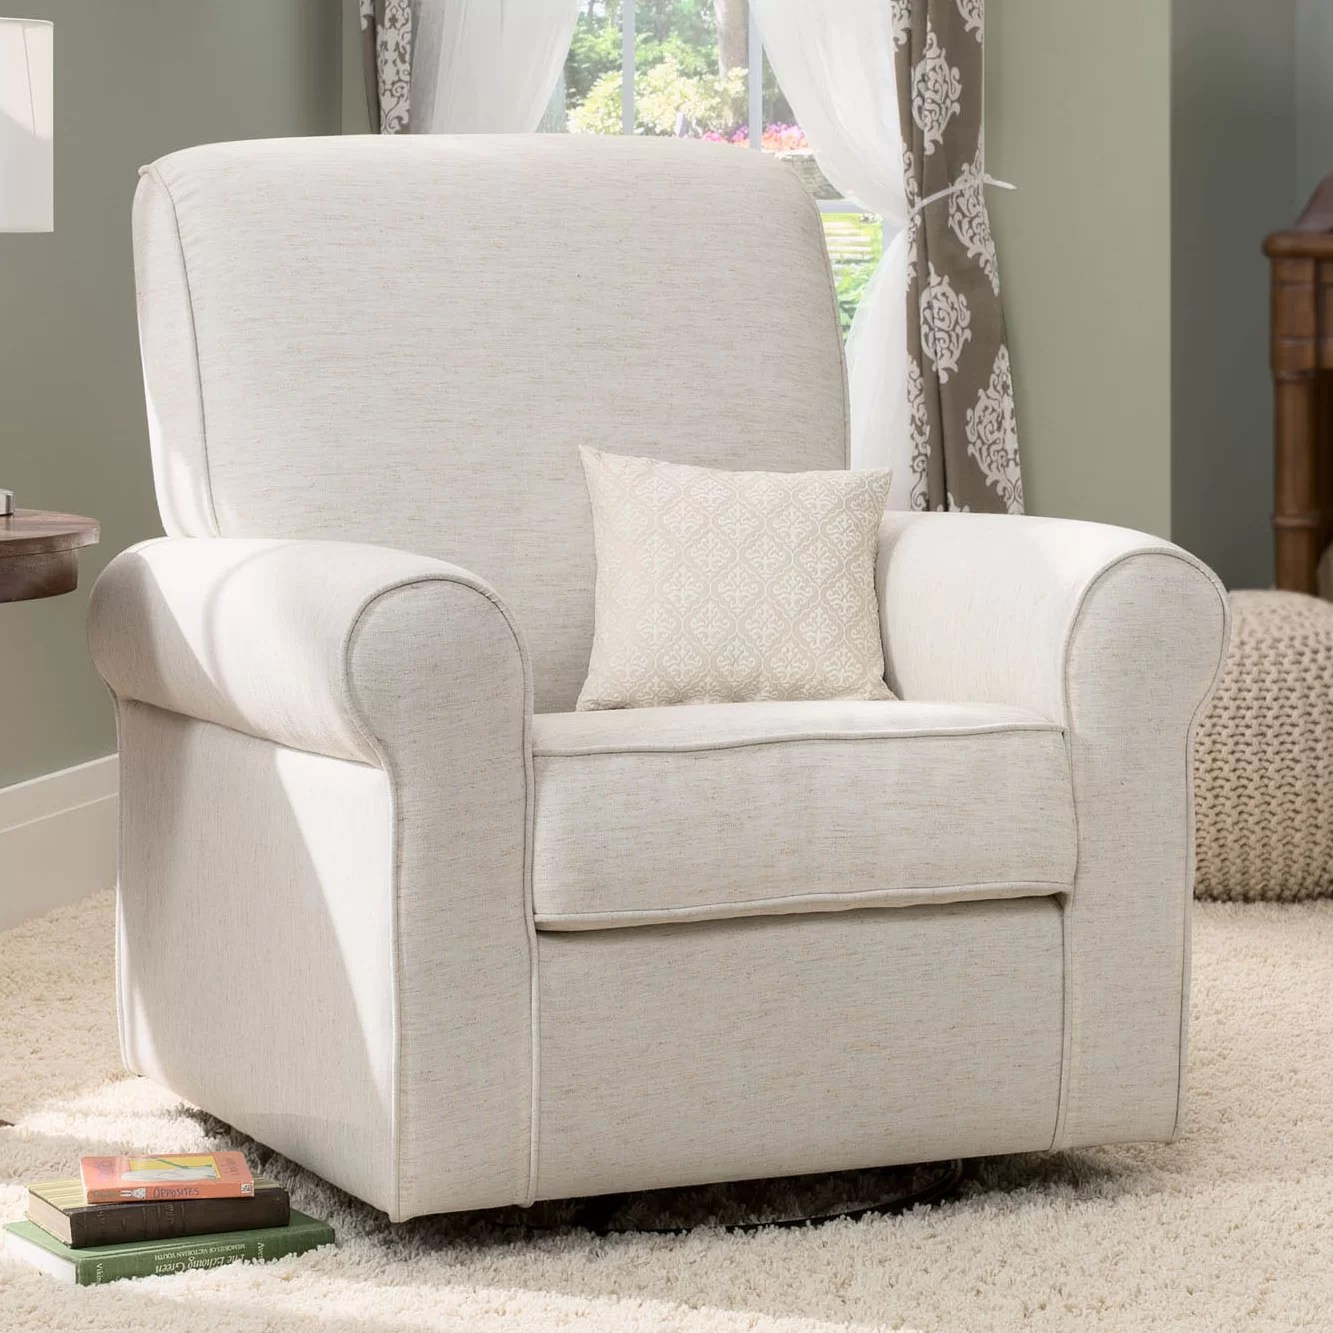 delta avery nursery glider chair grey dining captain chairs children swivel wayfair